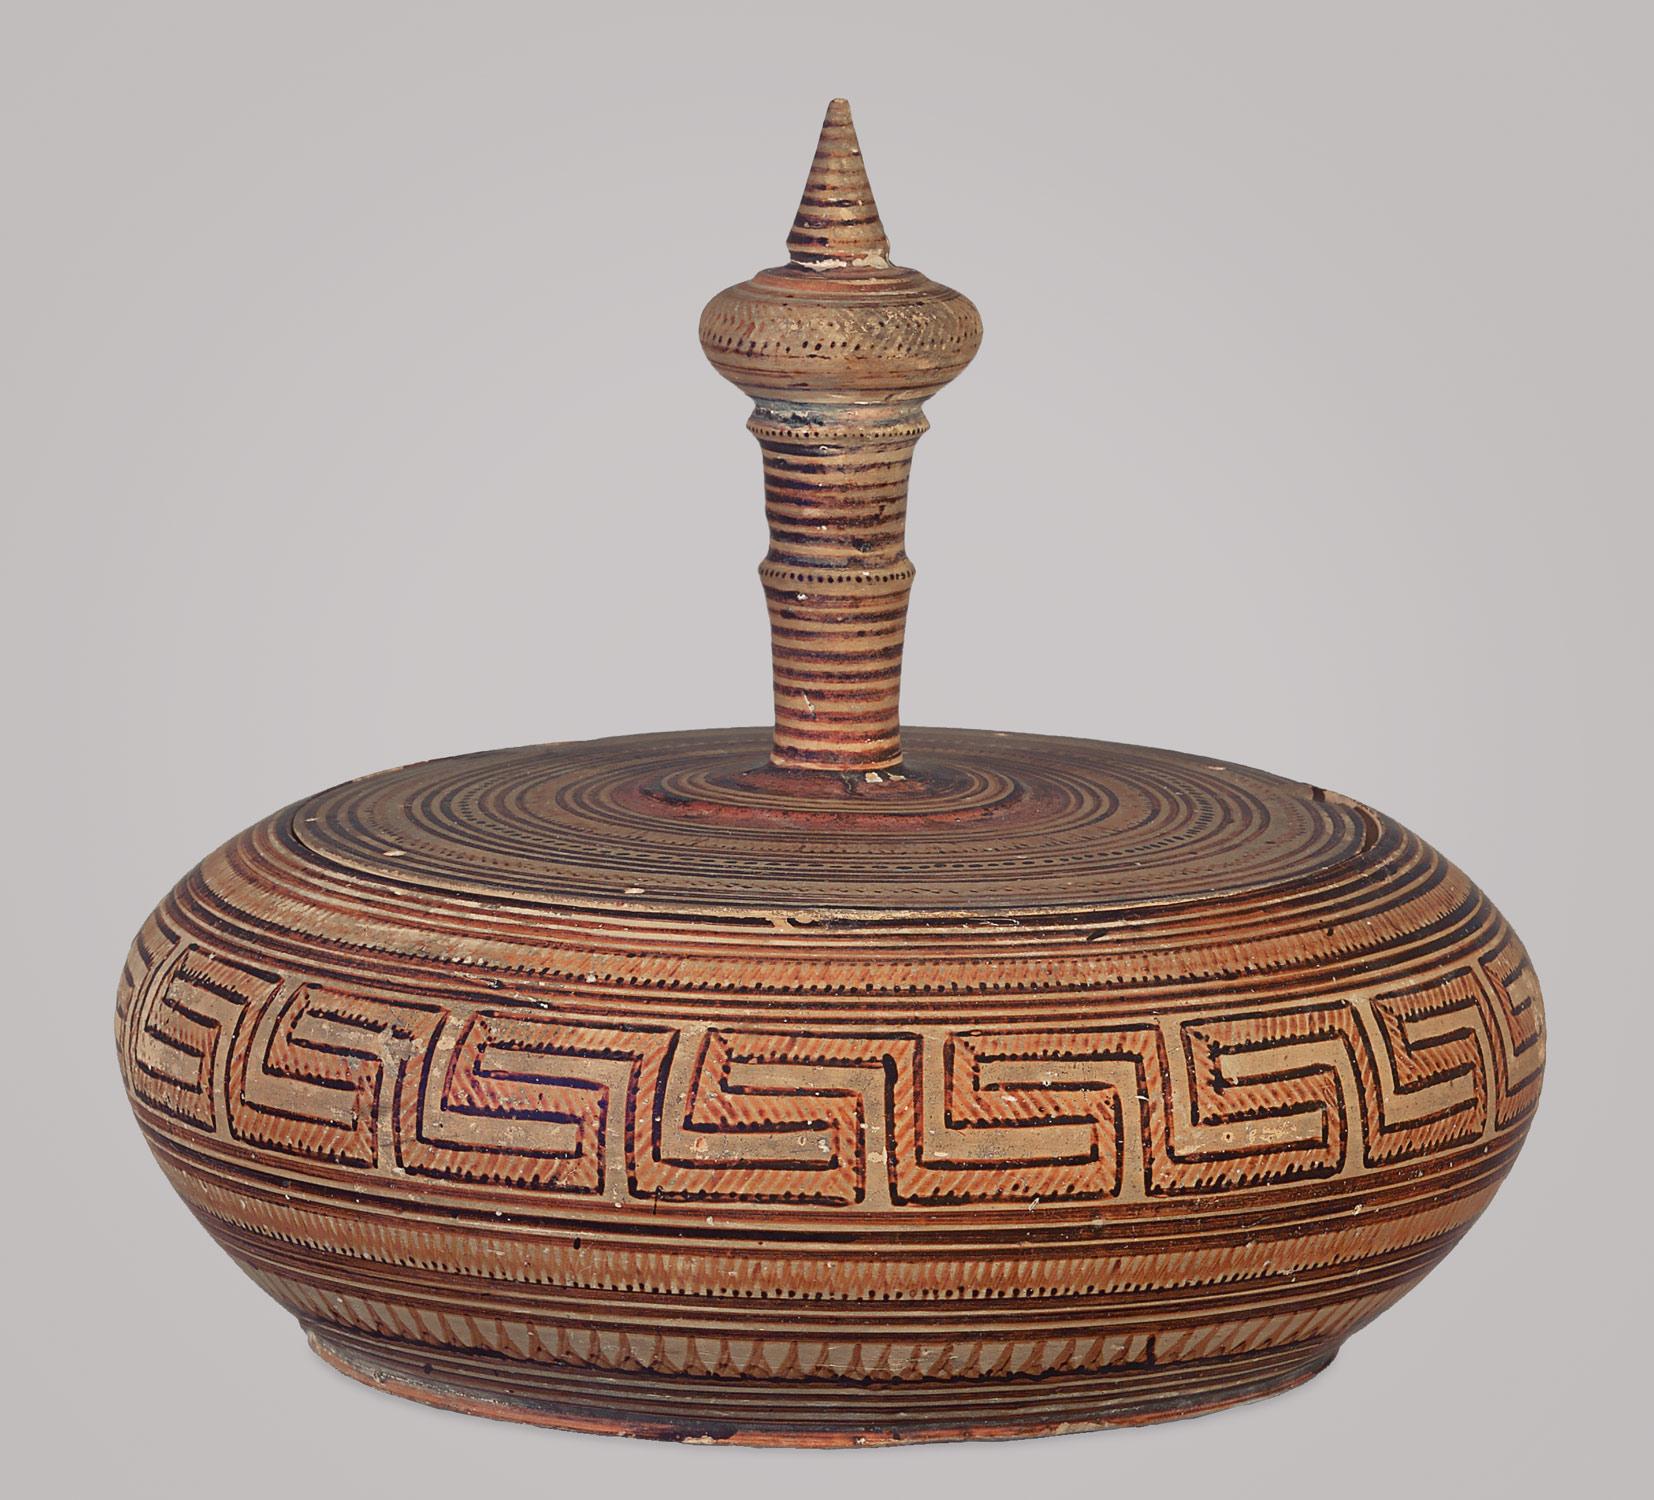 Geometric Art In Ancient Greece